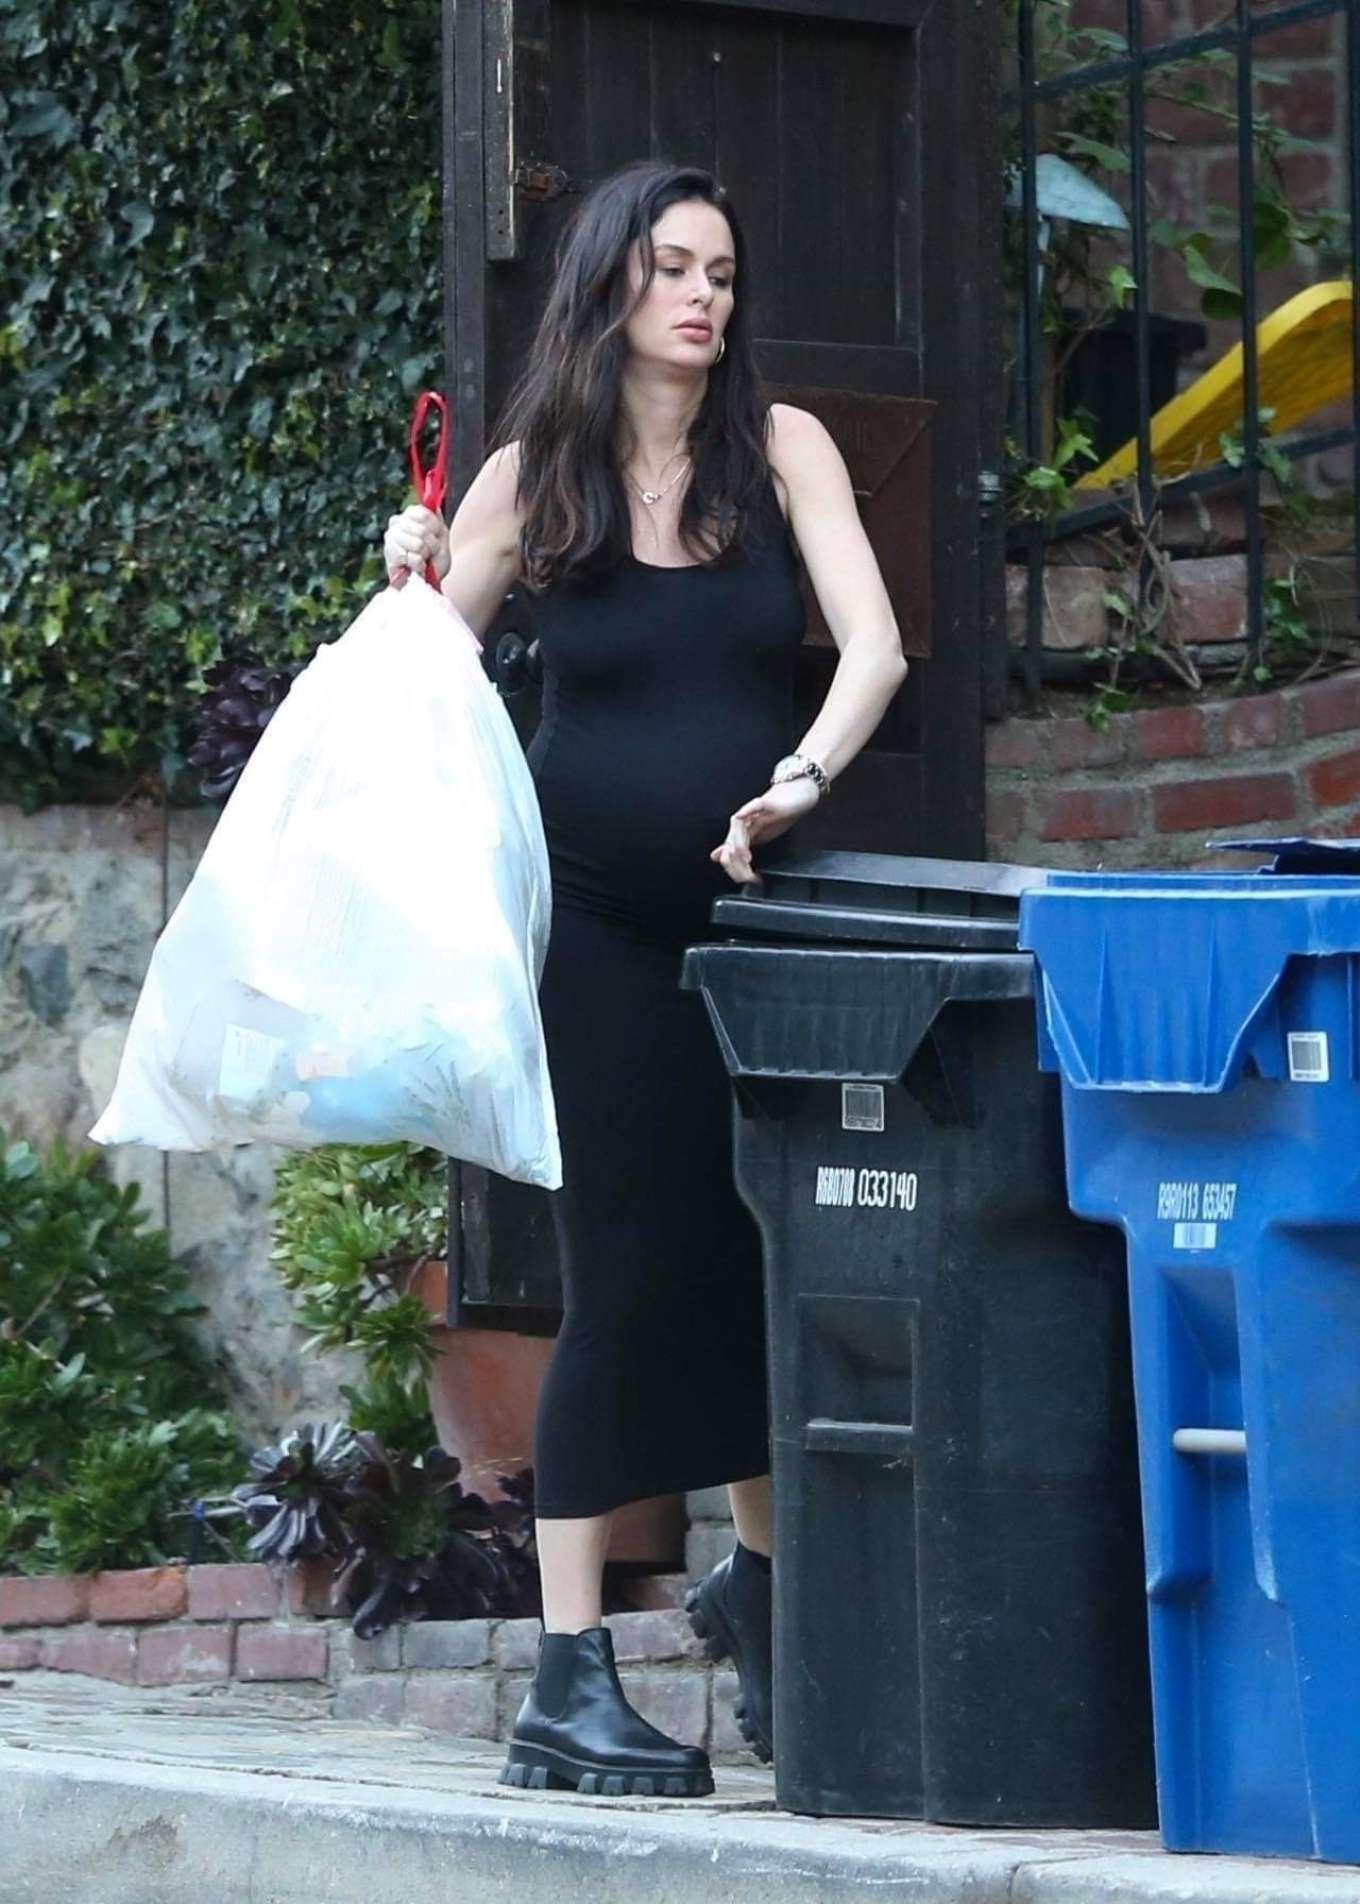 Nicole Trunfio taking out the trash